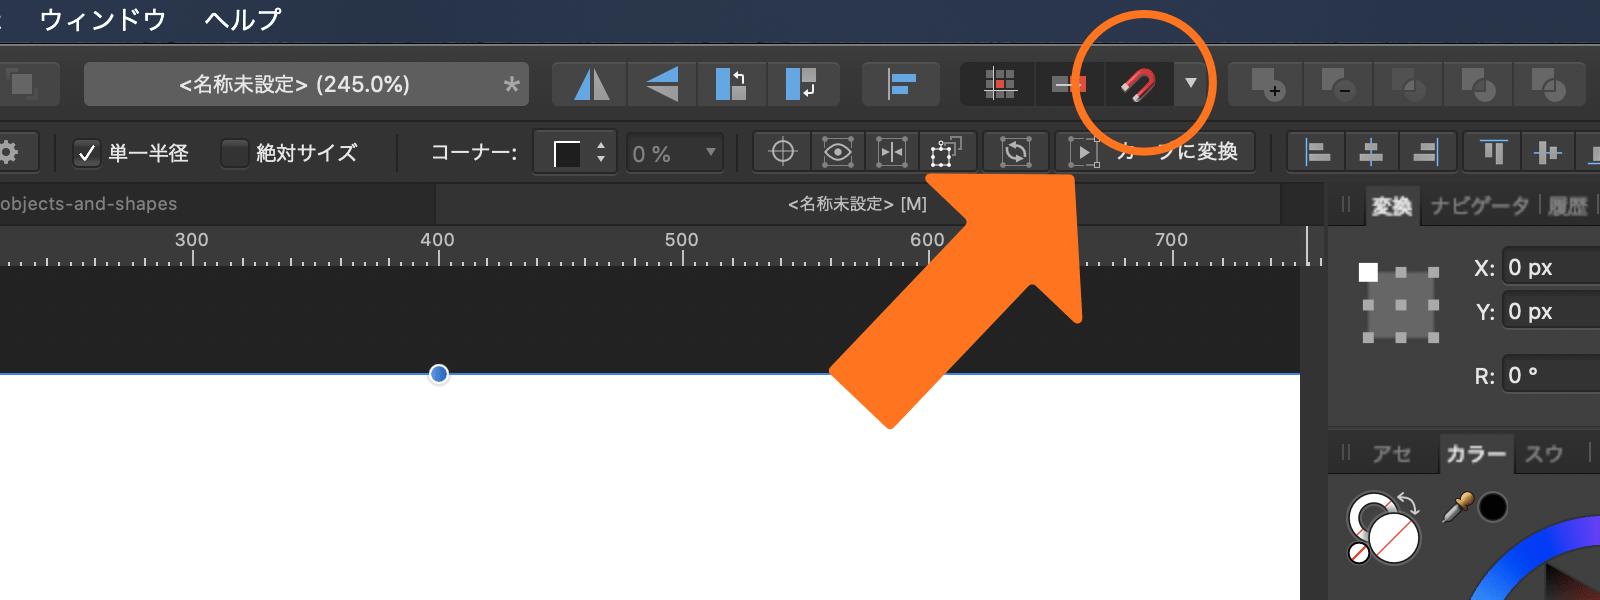 Affinity Designerの画面。磁石アイコンがオレンジの矢印で示されている